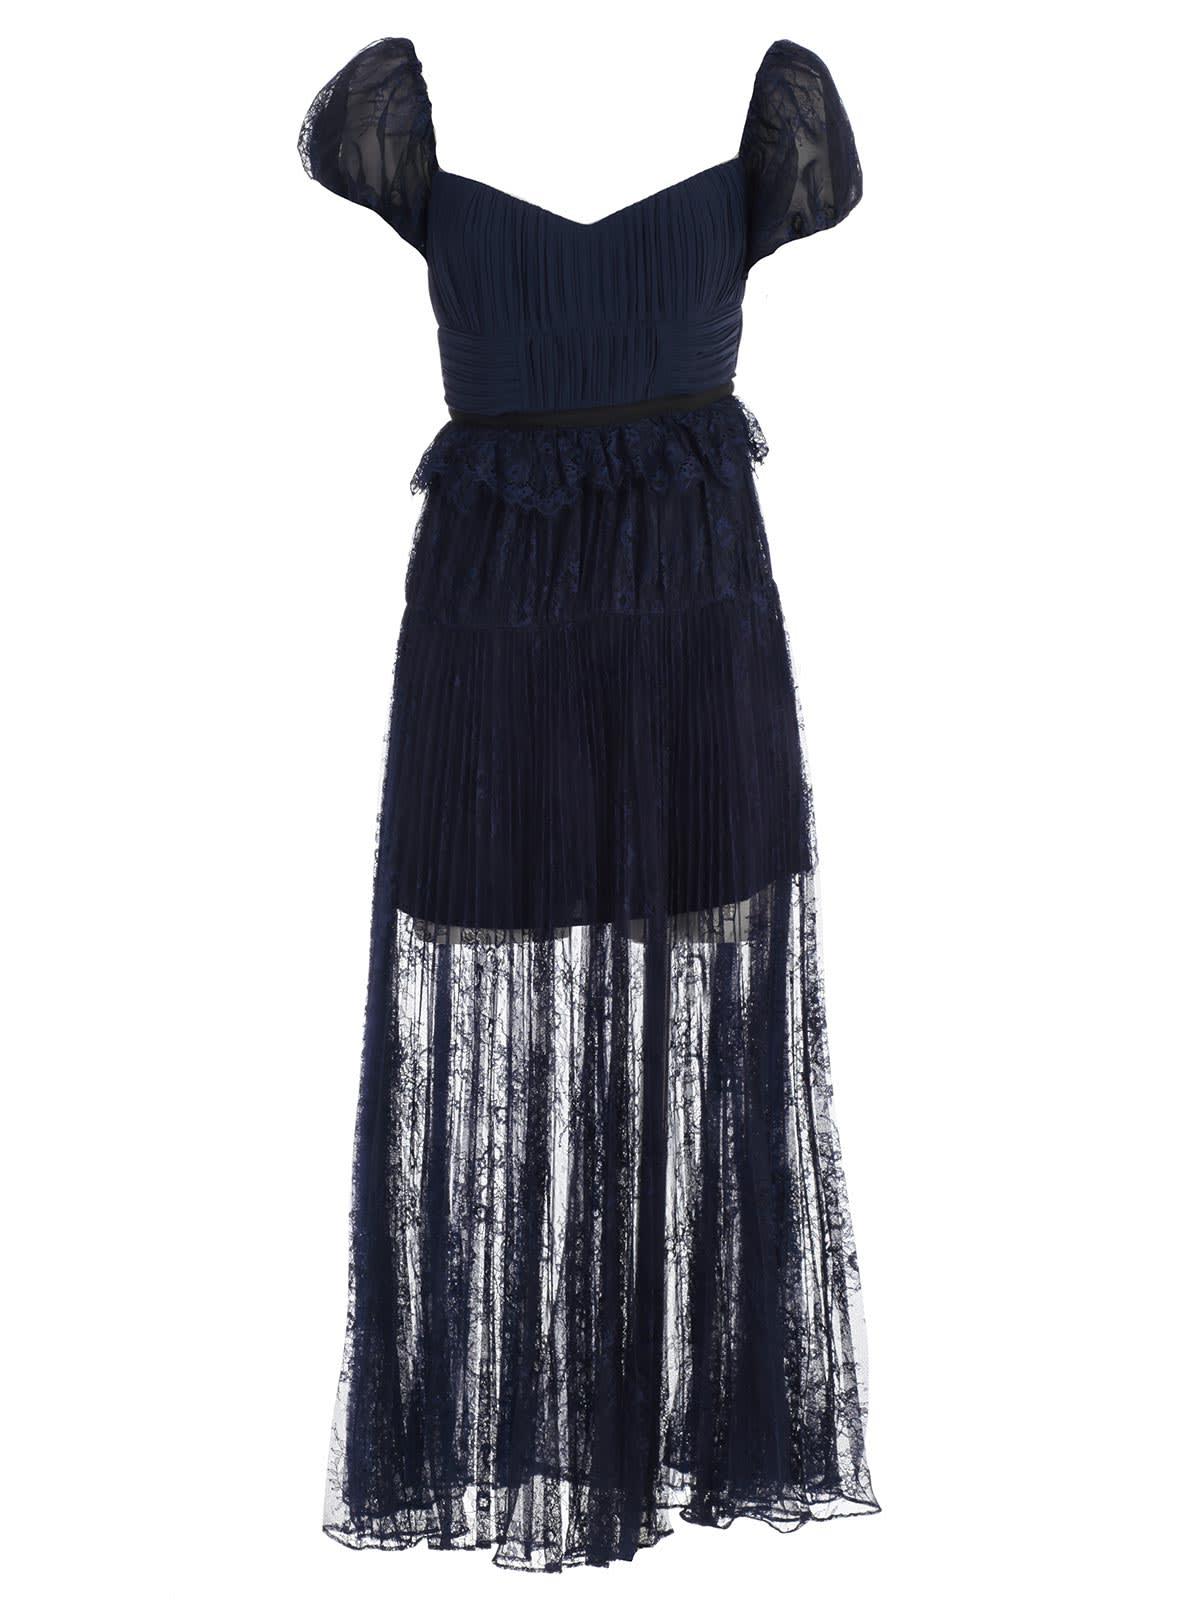 self-portrait Dress S & sv Neck Bustier W & lace